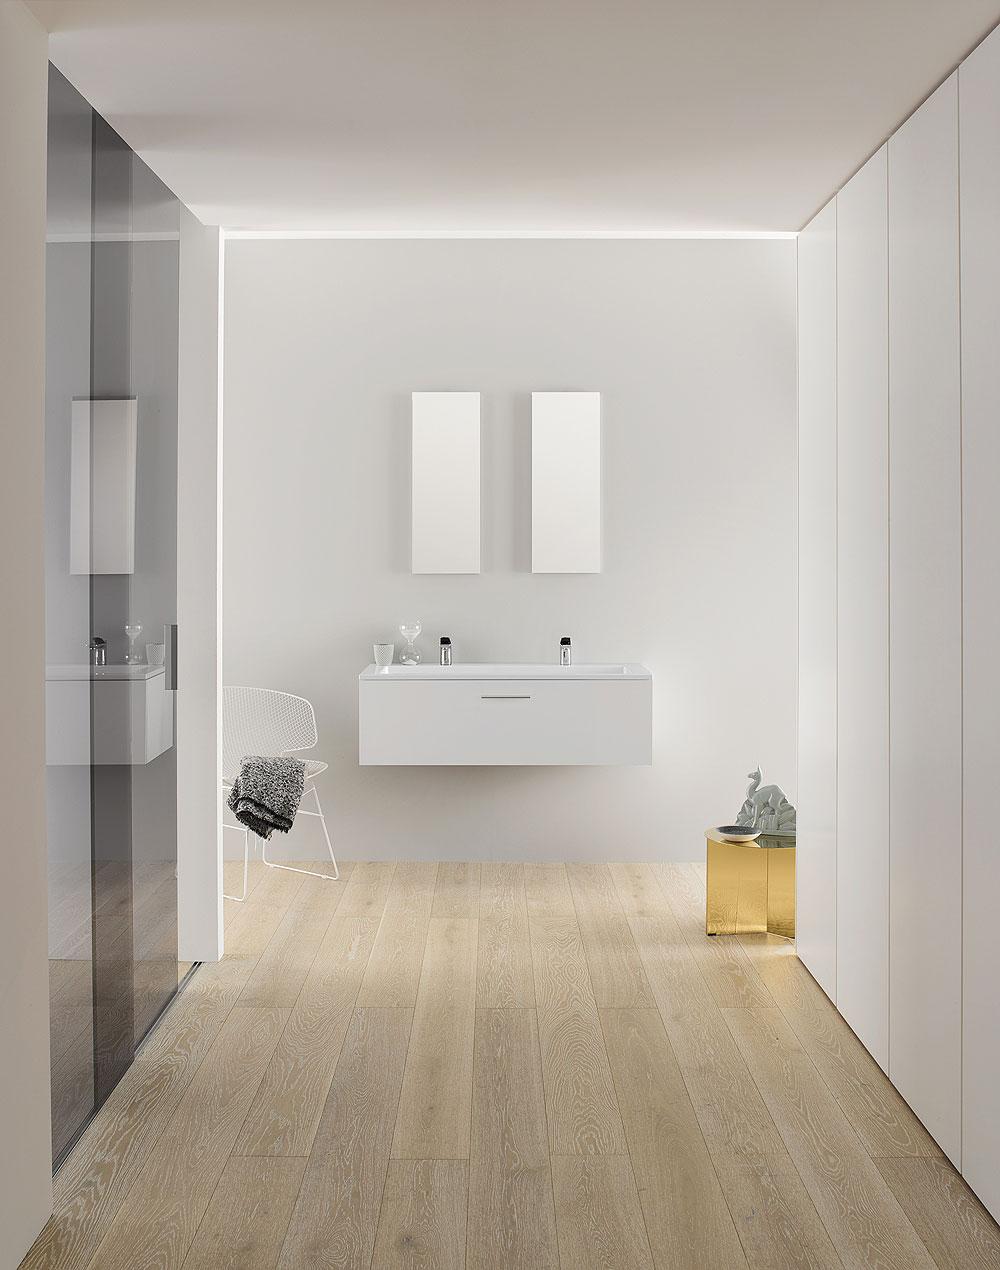 lavamanos-twice-sieger-design-alape (1)